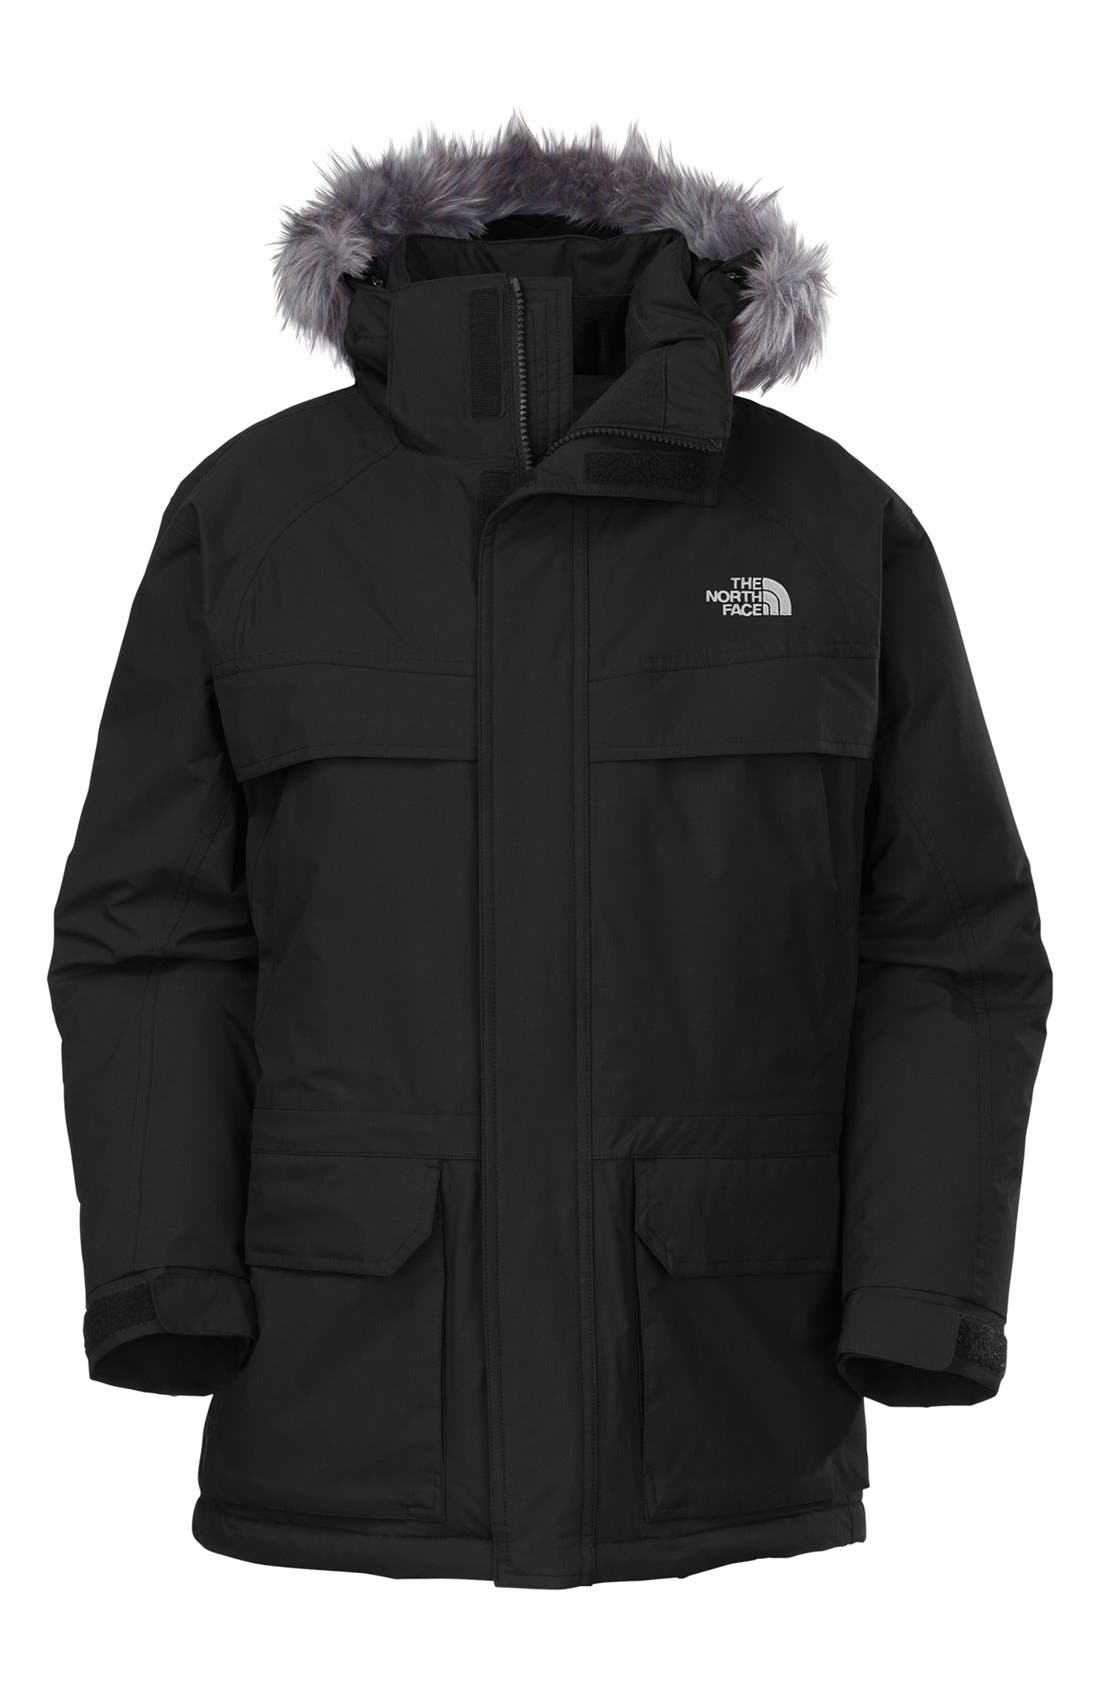 Alternate Image 1 Selected - The North Face 'McMurdo' HyVent® Waterproof Heatseeker Parka with Faux Fur Trim (Big Boys)